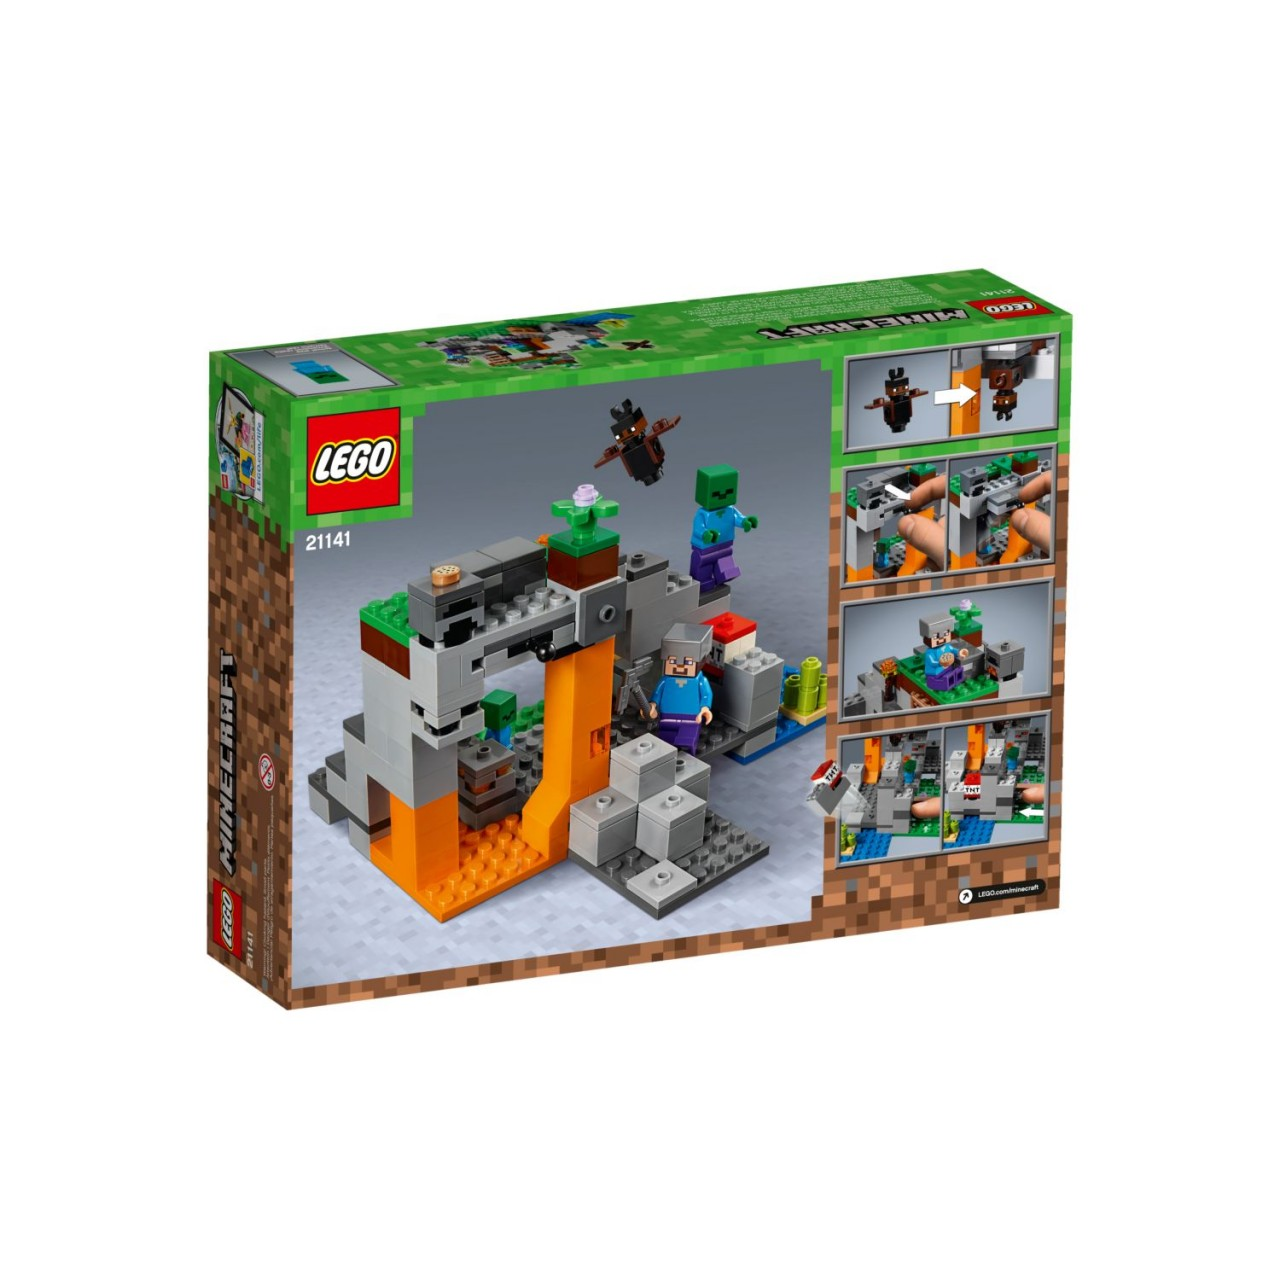 LEGO MINECRAFT 21141 Zombiehöhle